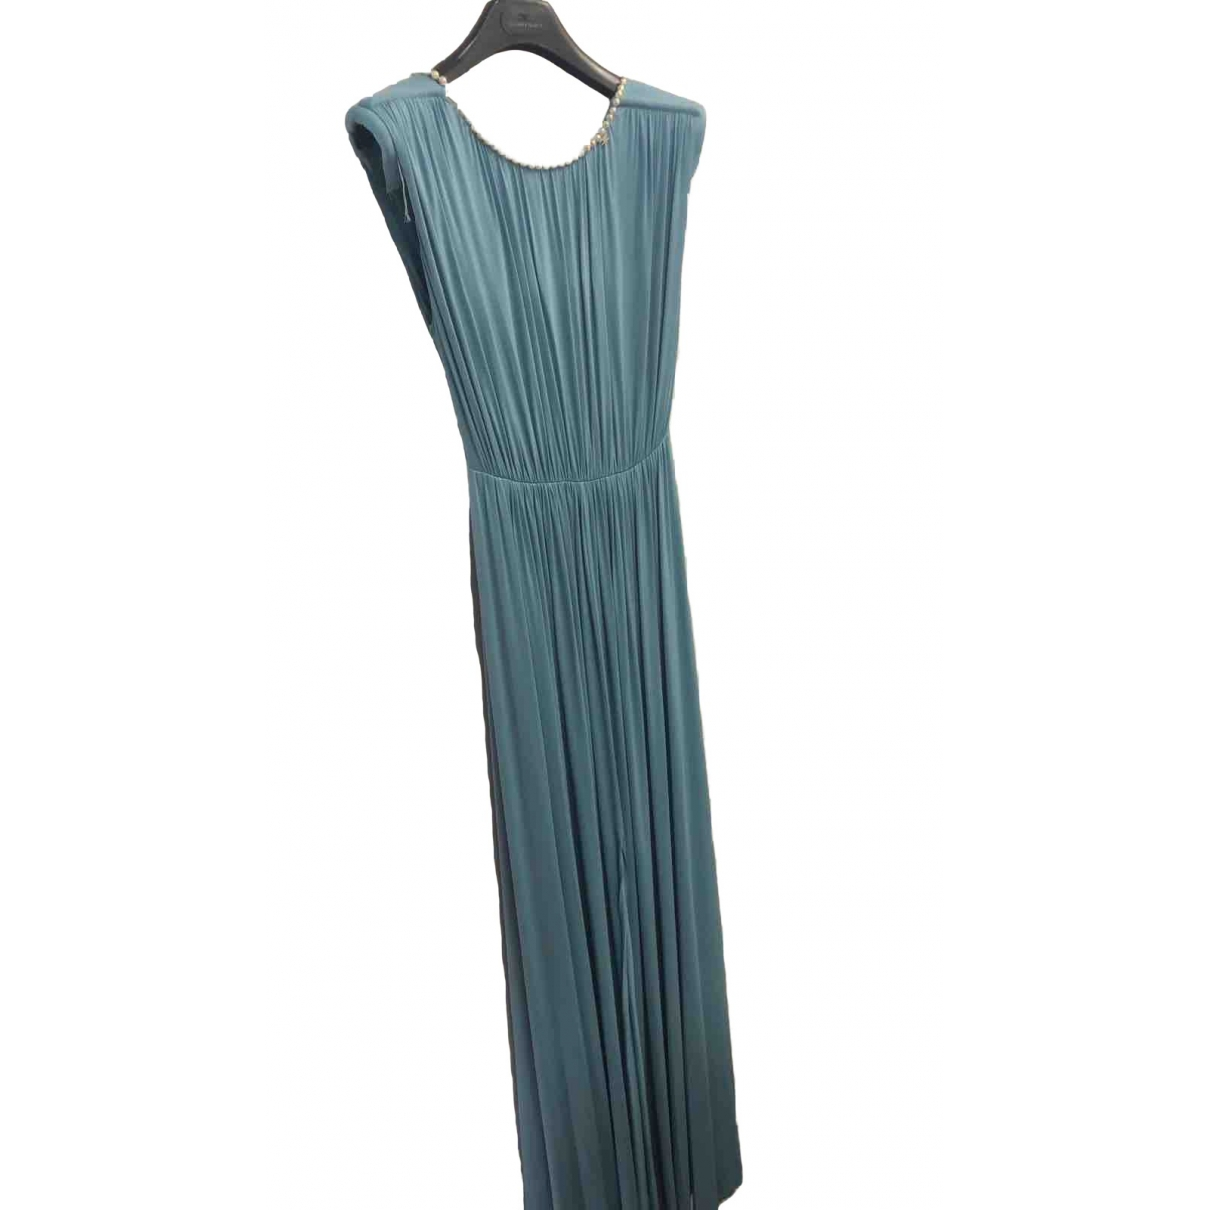 Elisabetta Franchi \N Turquoise Silk dress for Women 42 IT